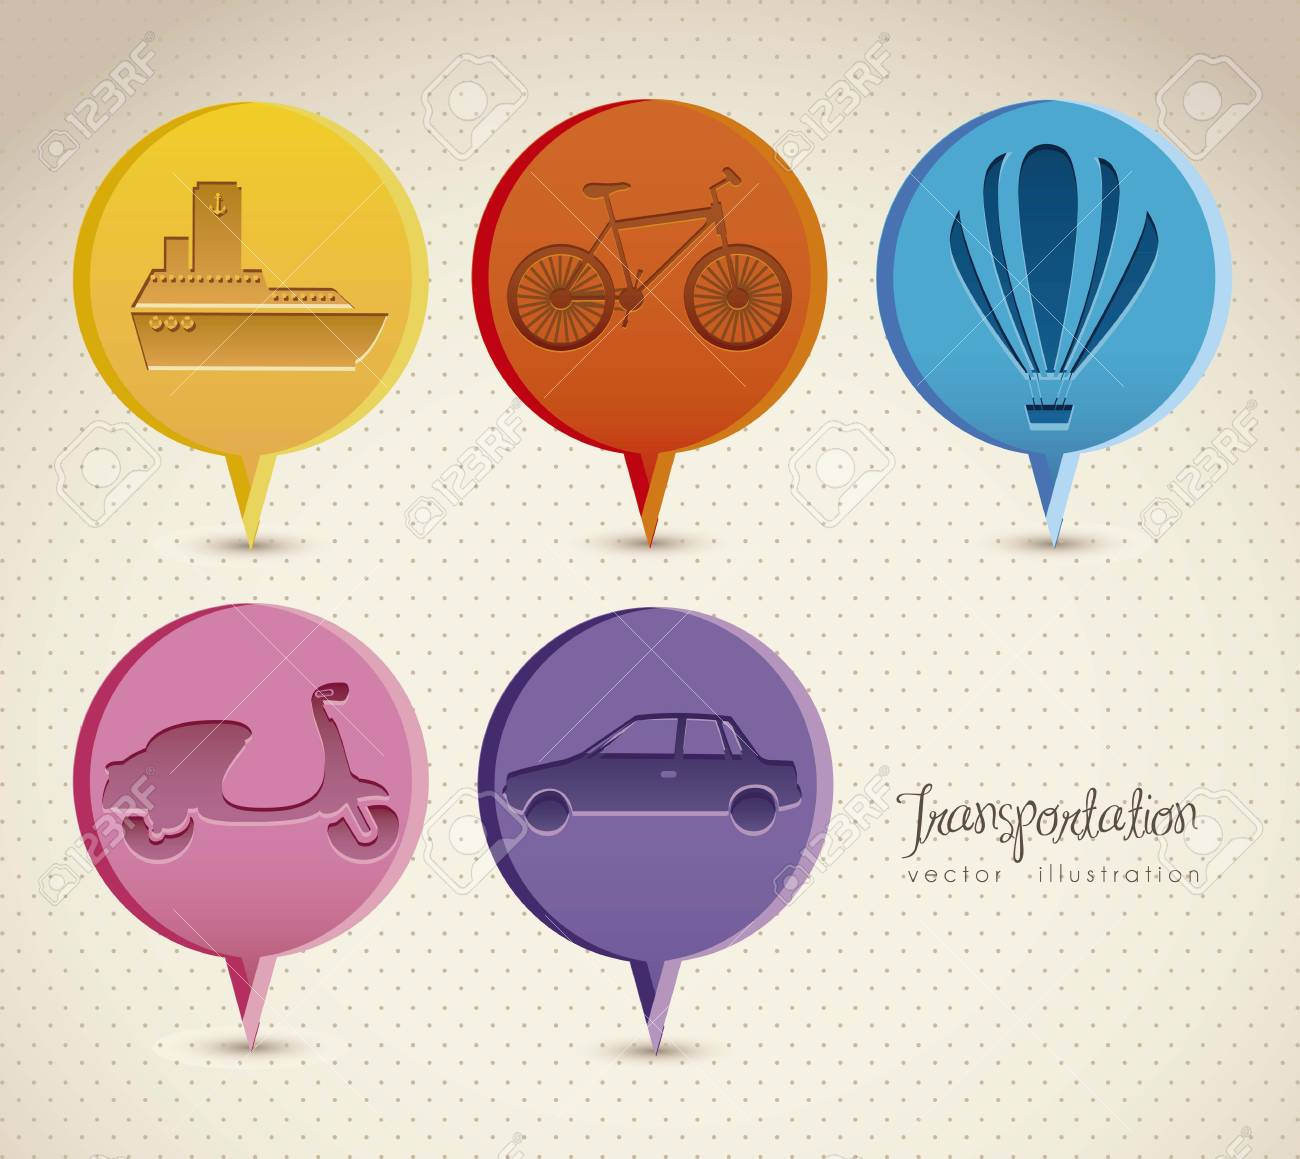 Illustration of transportation icons around the world, vector illustration Stock Vector - 15309057